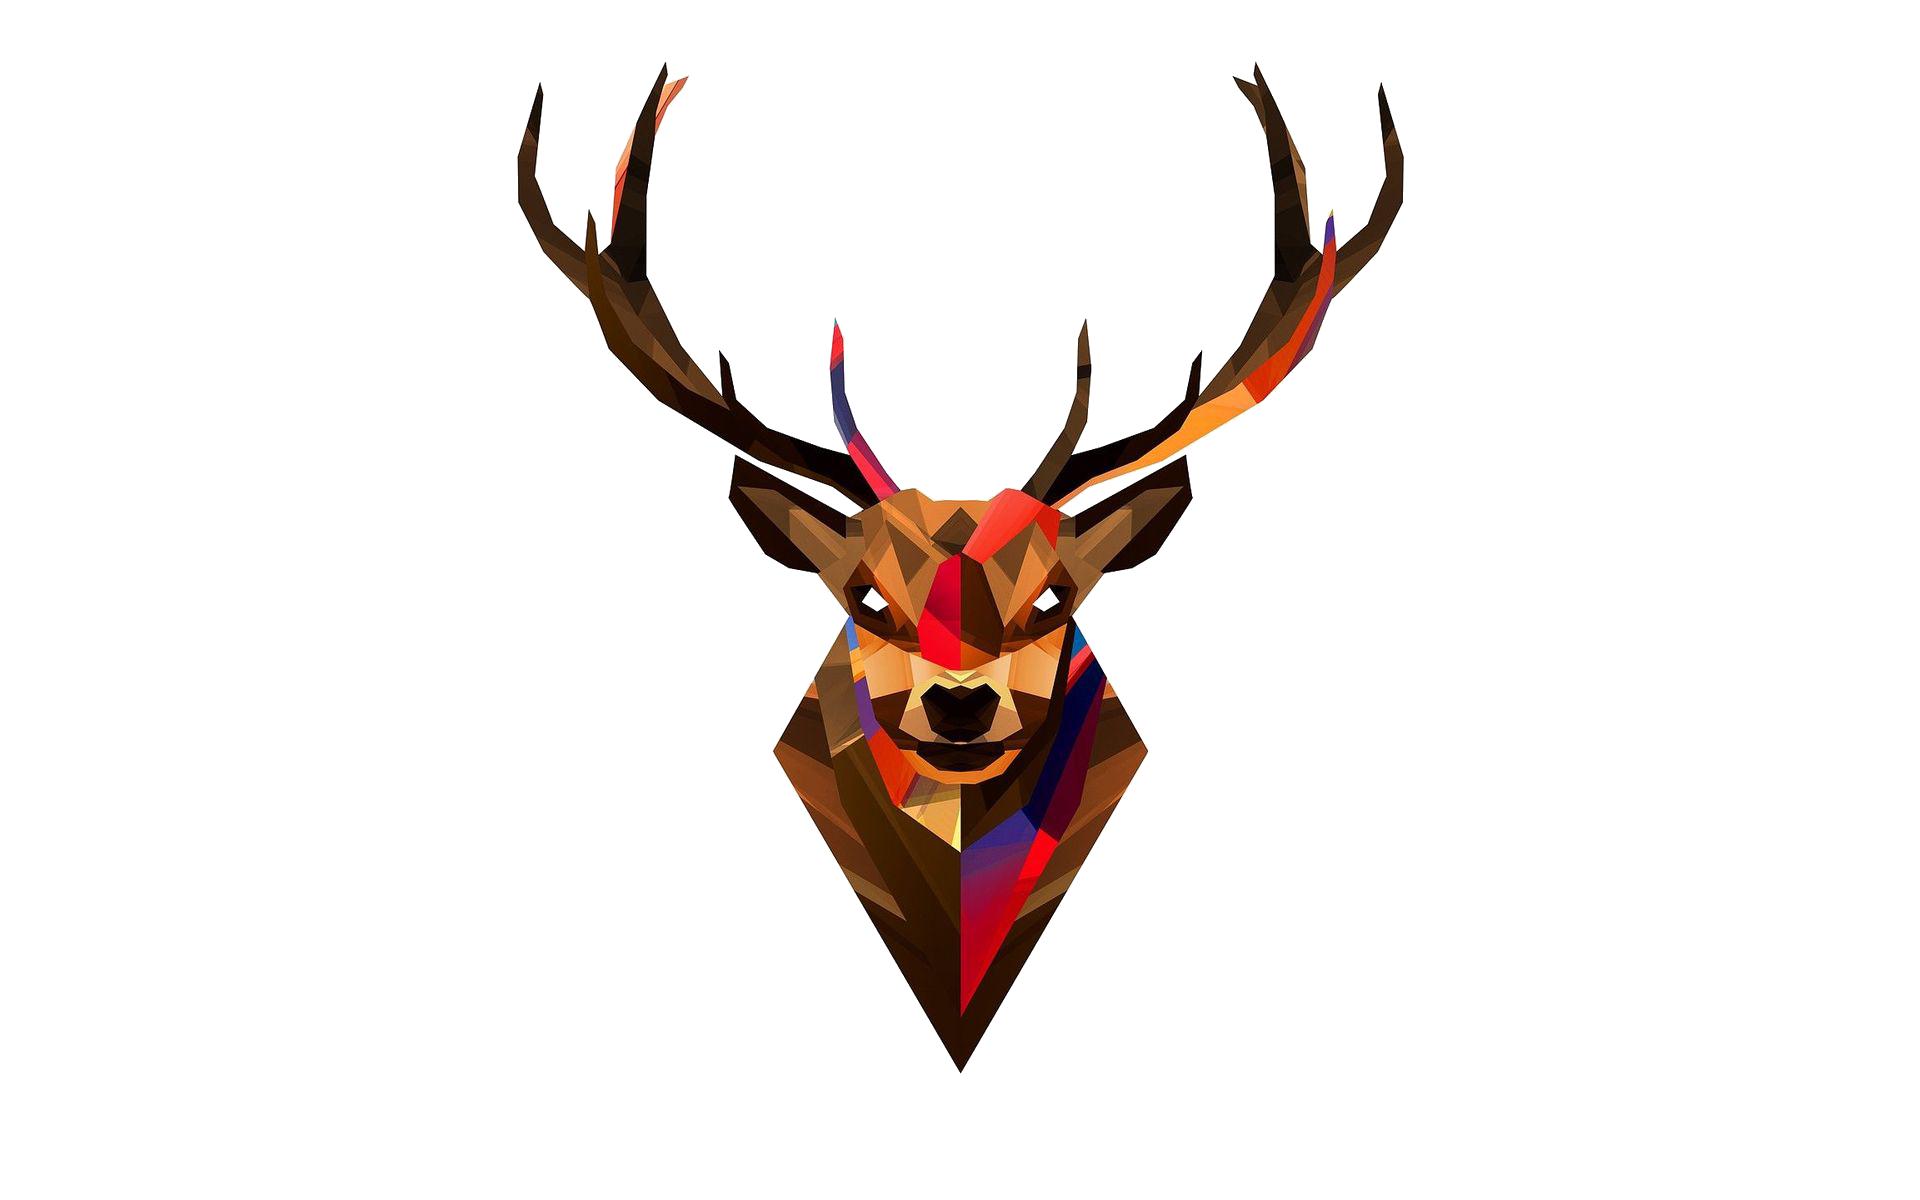 1920x1200 Deer Png Images Transparent Free Download